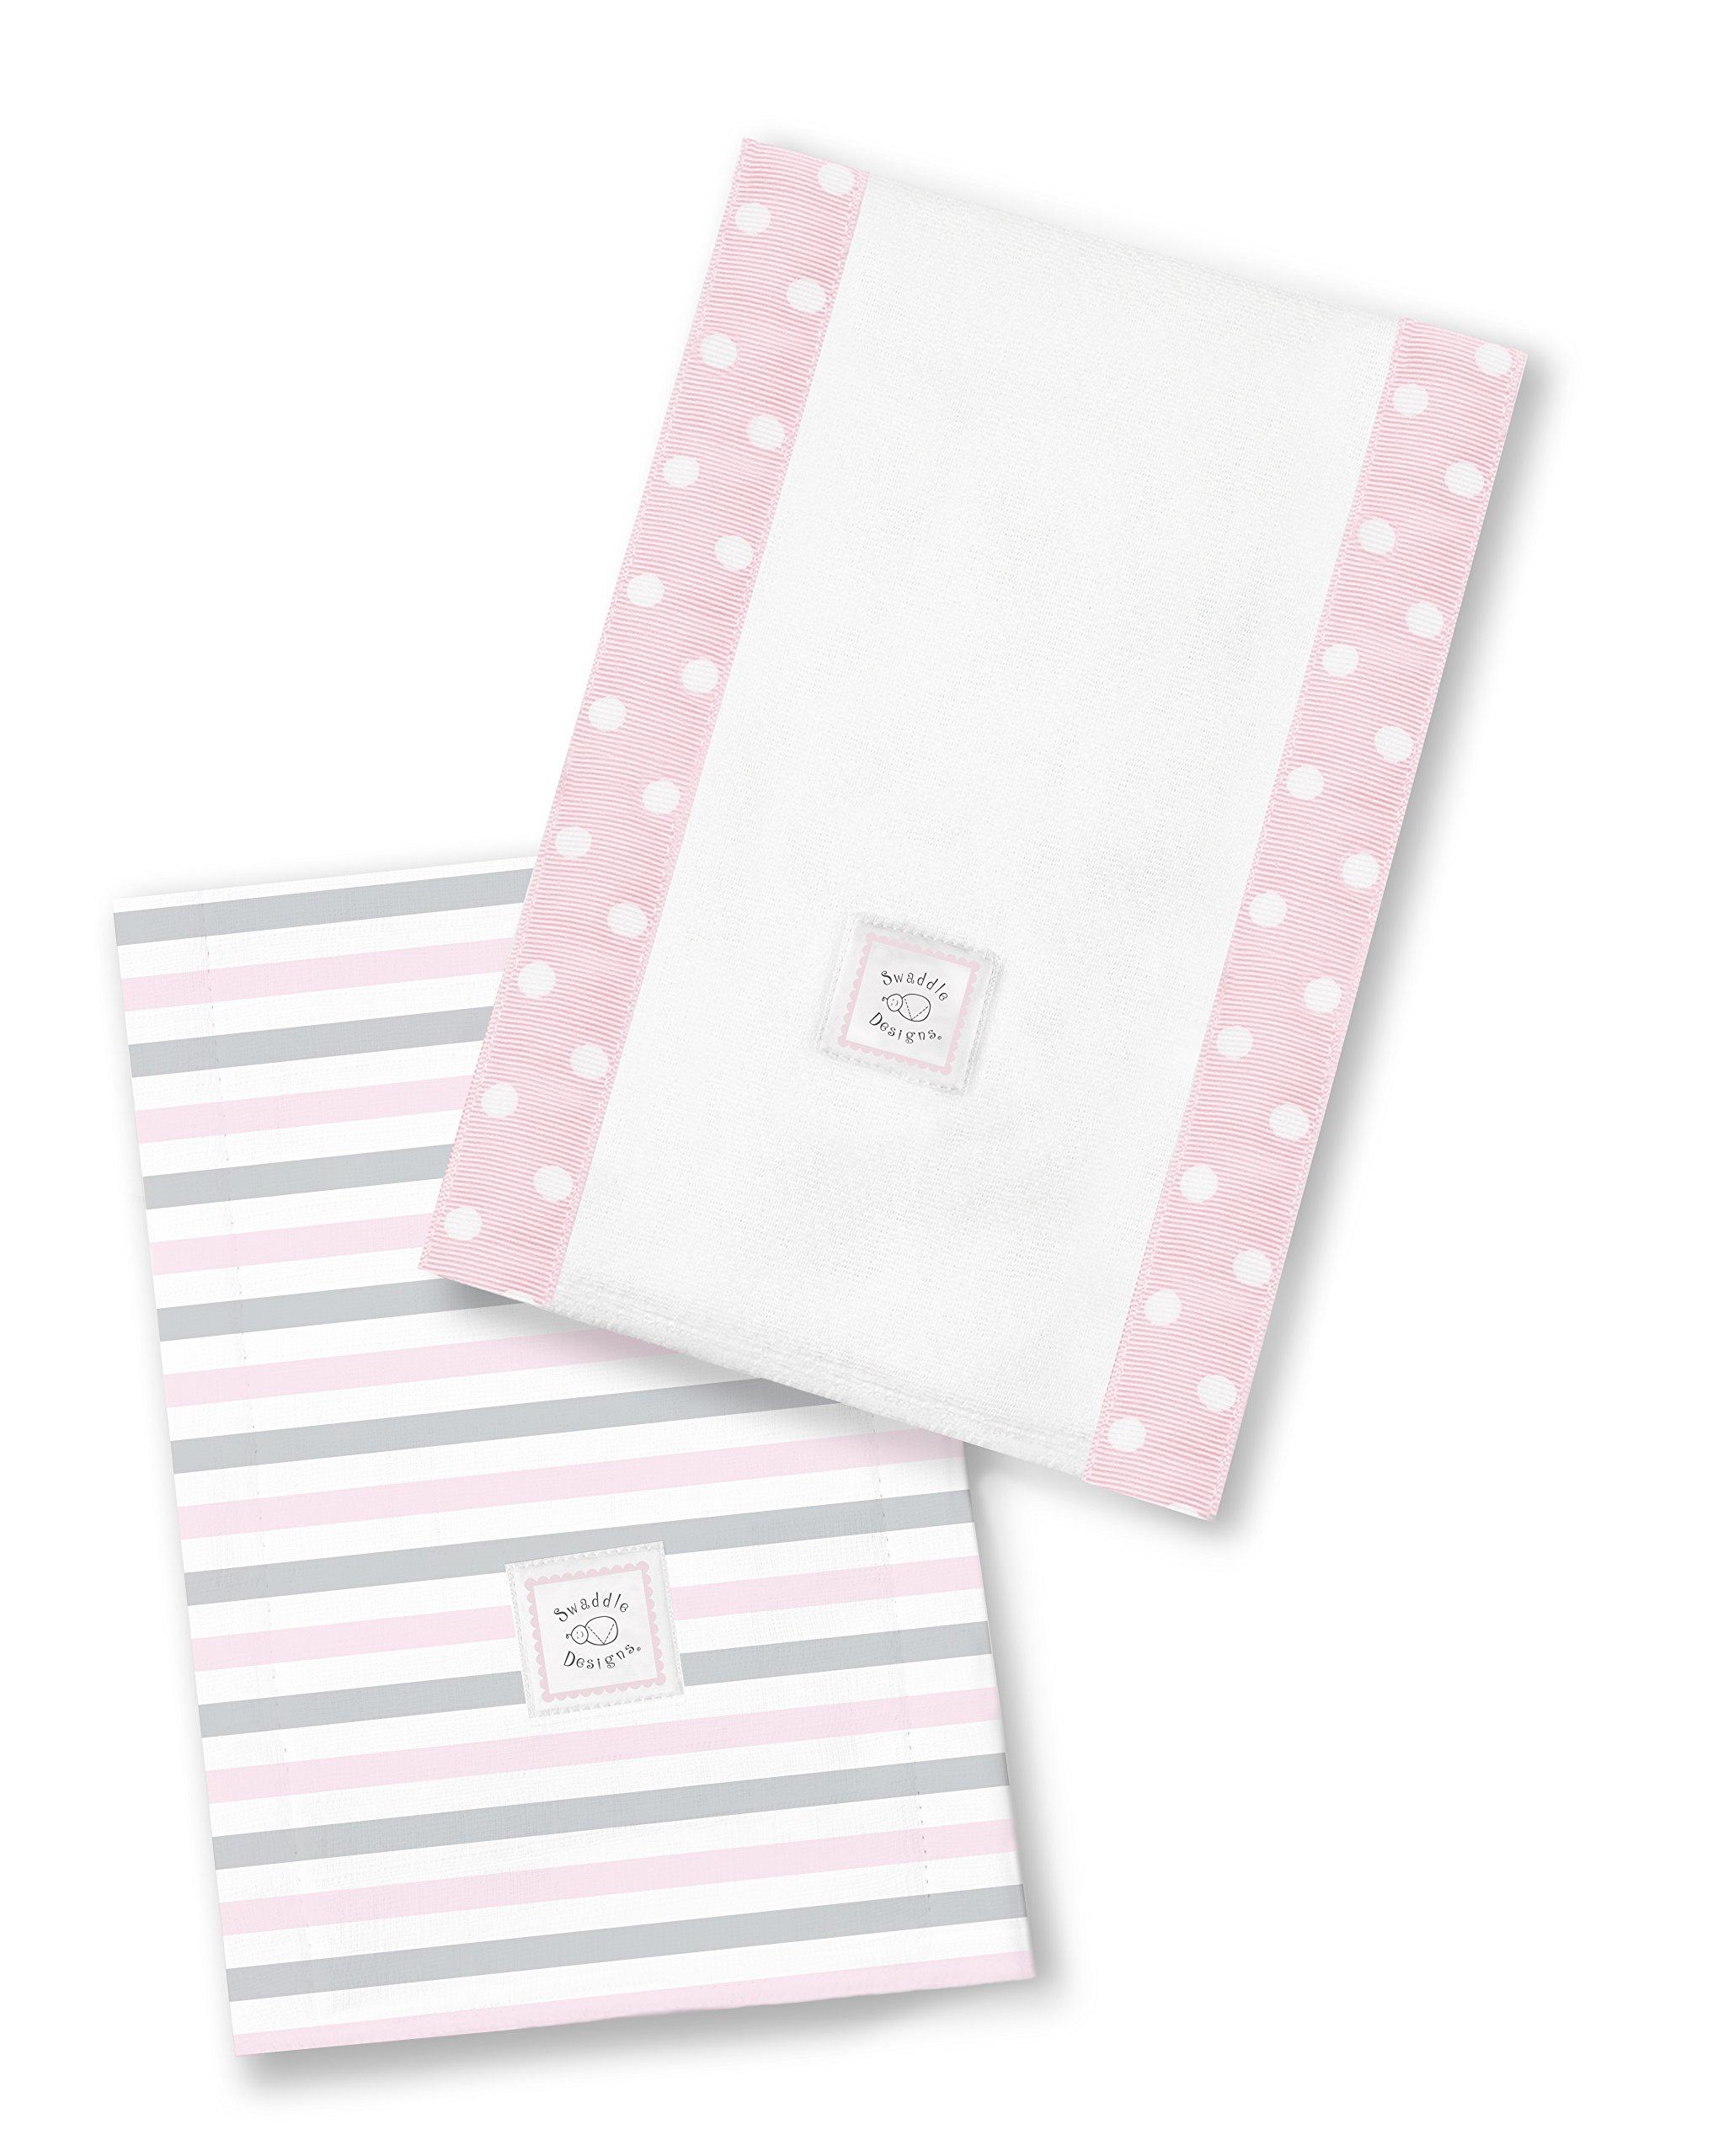 SwaddleDesigns Baby Burpies, Set of 2 Cotton Burp Cloths, Pastel Pink Simple Stripes